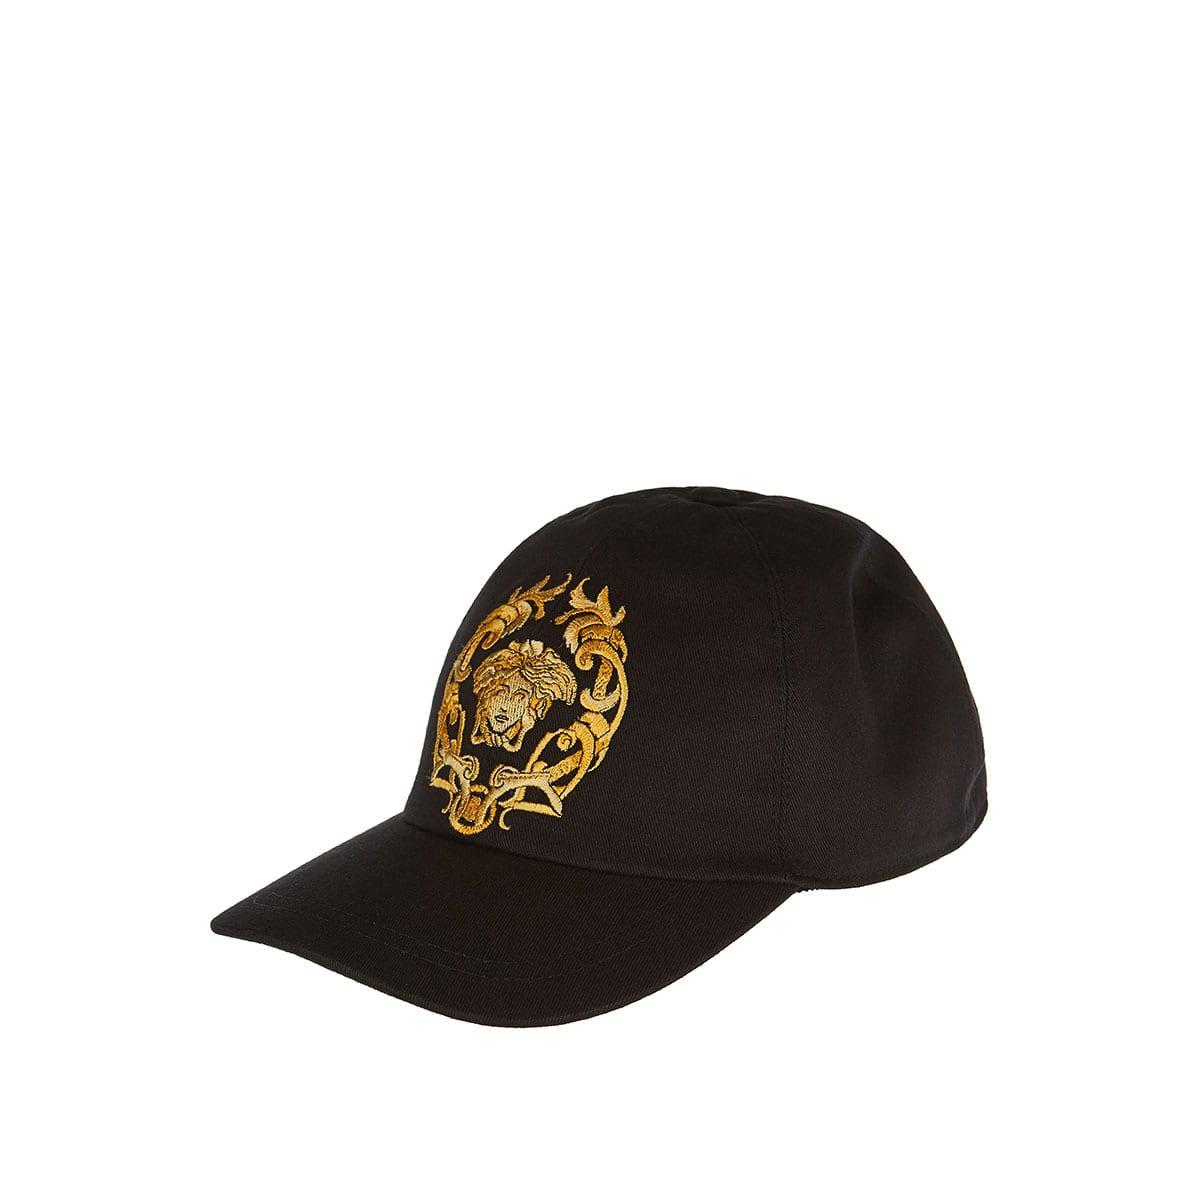 Medusa embroidered cap